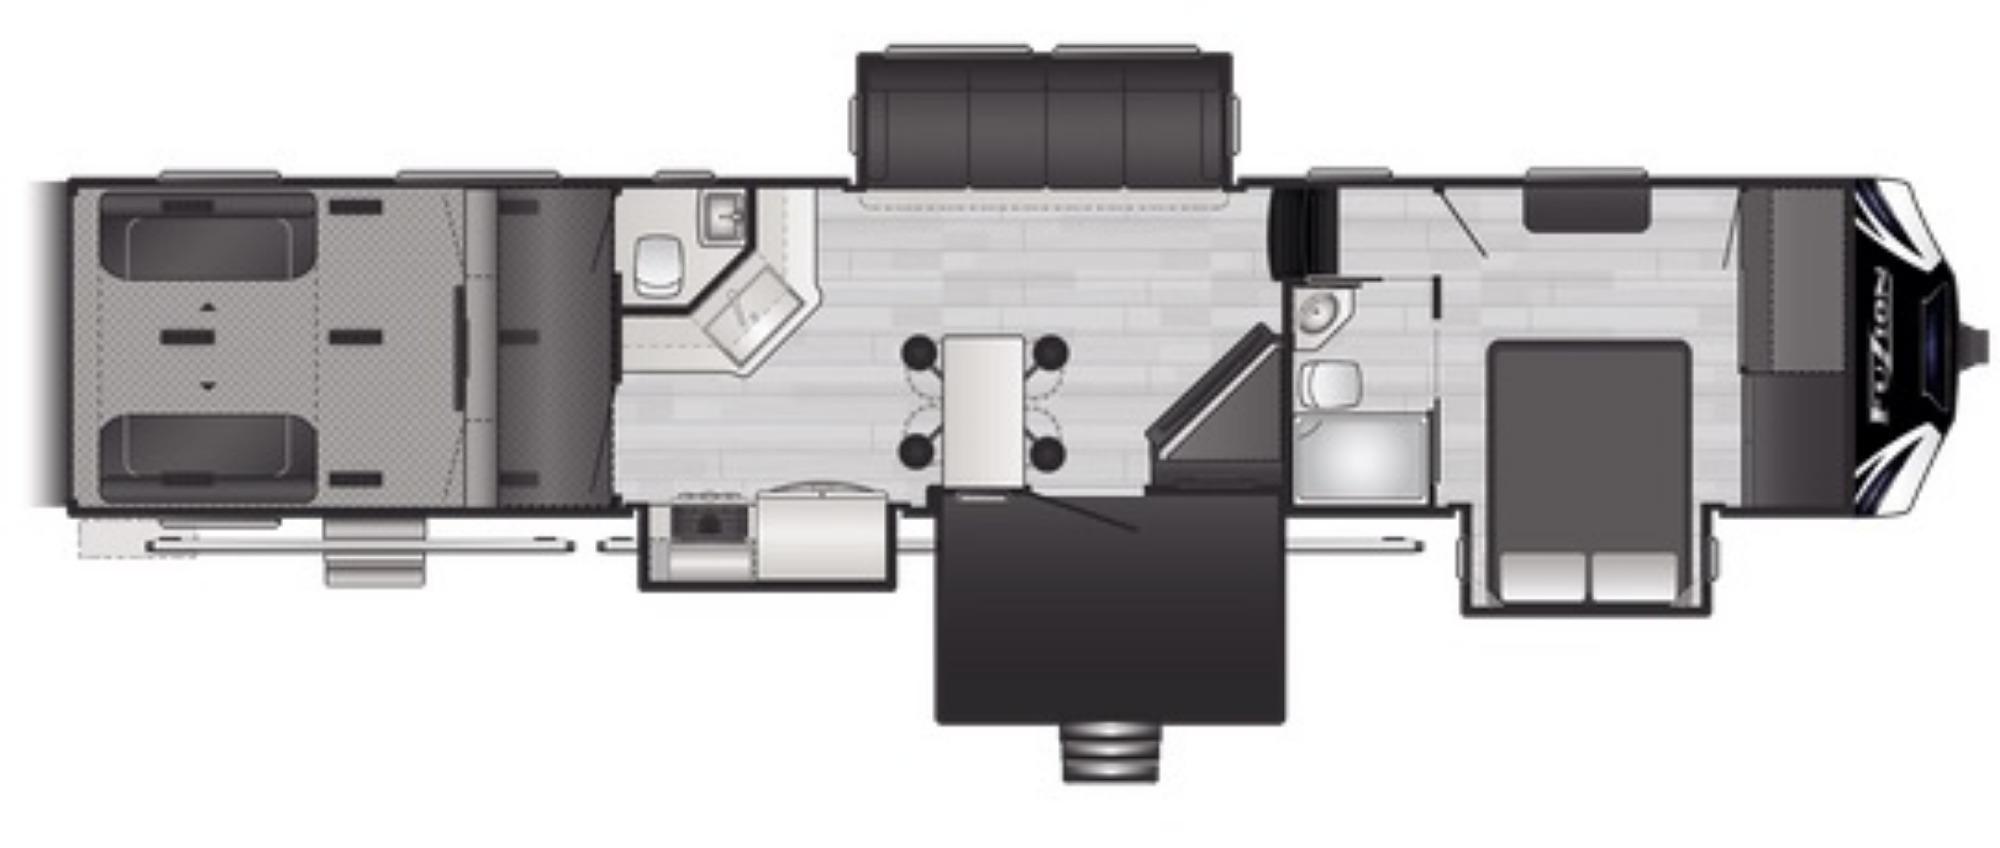 View Floor Plan for 2021 KEYSTONE FUZION 424